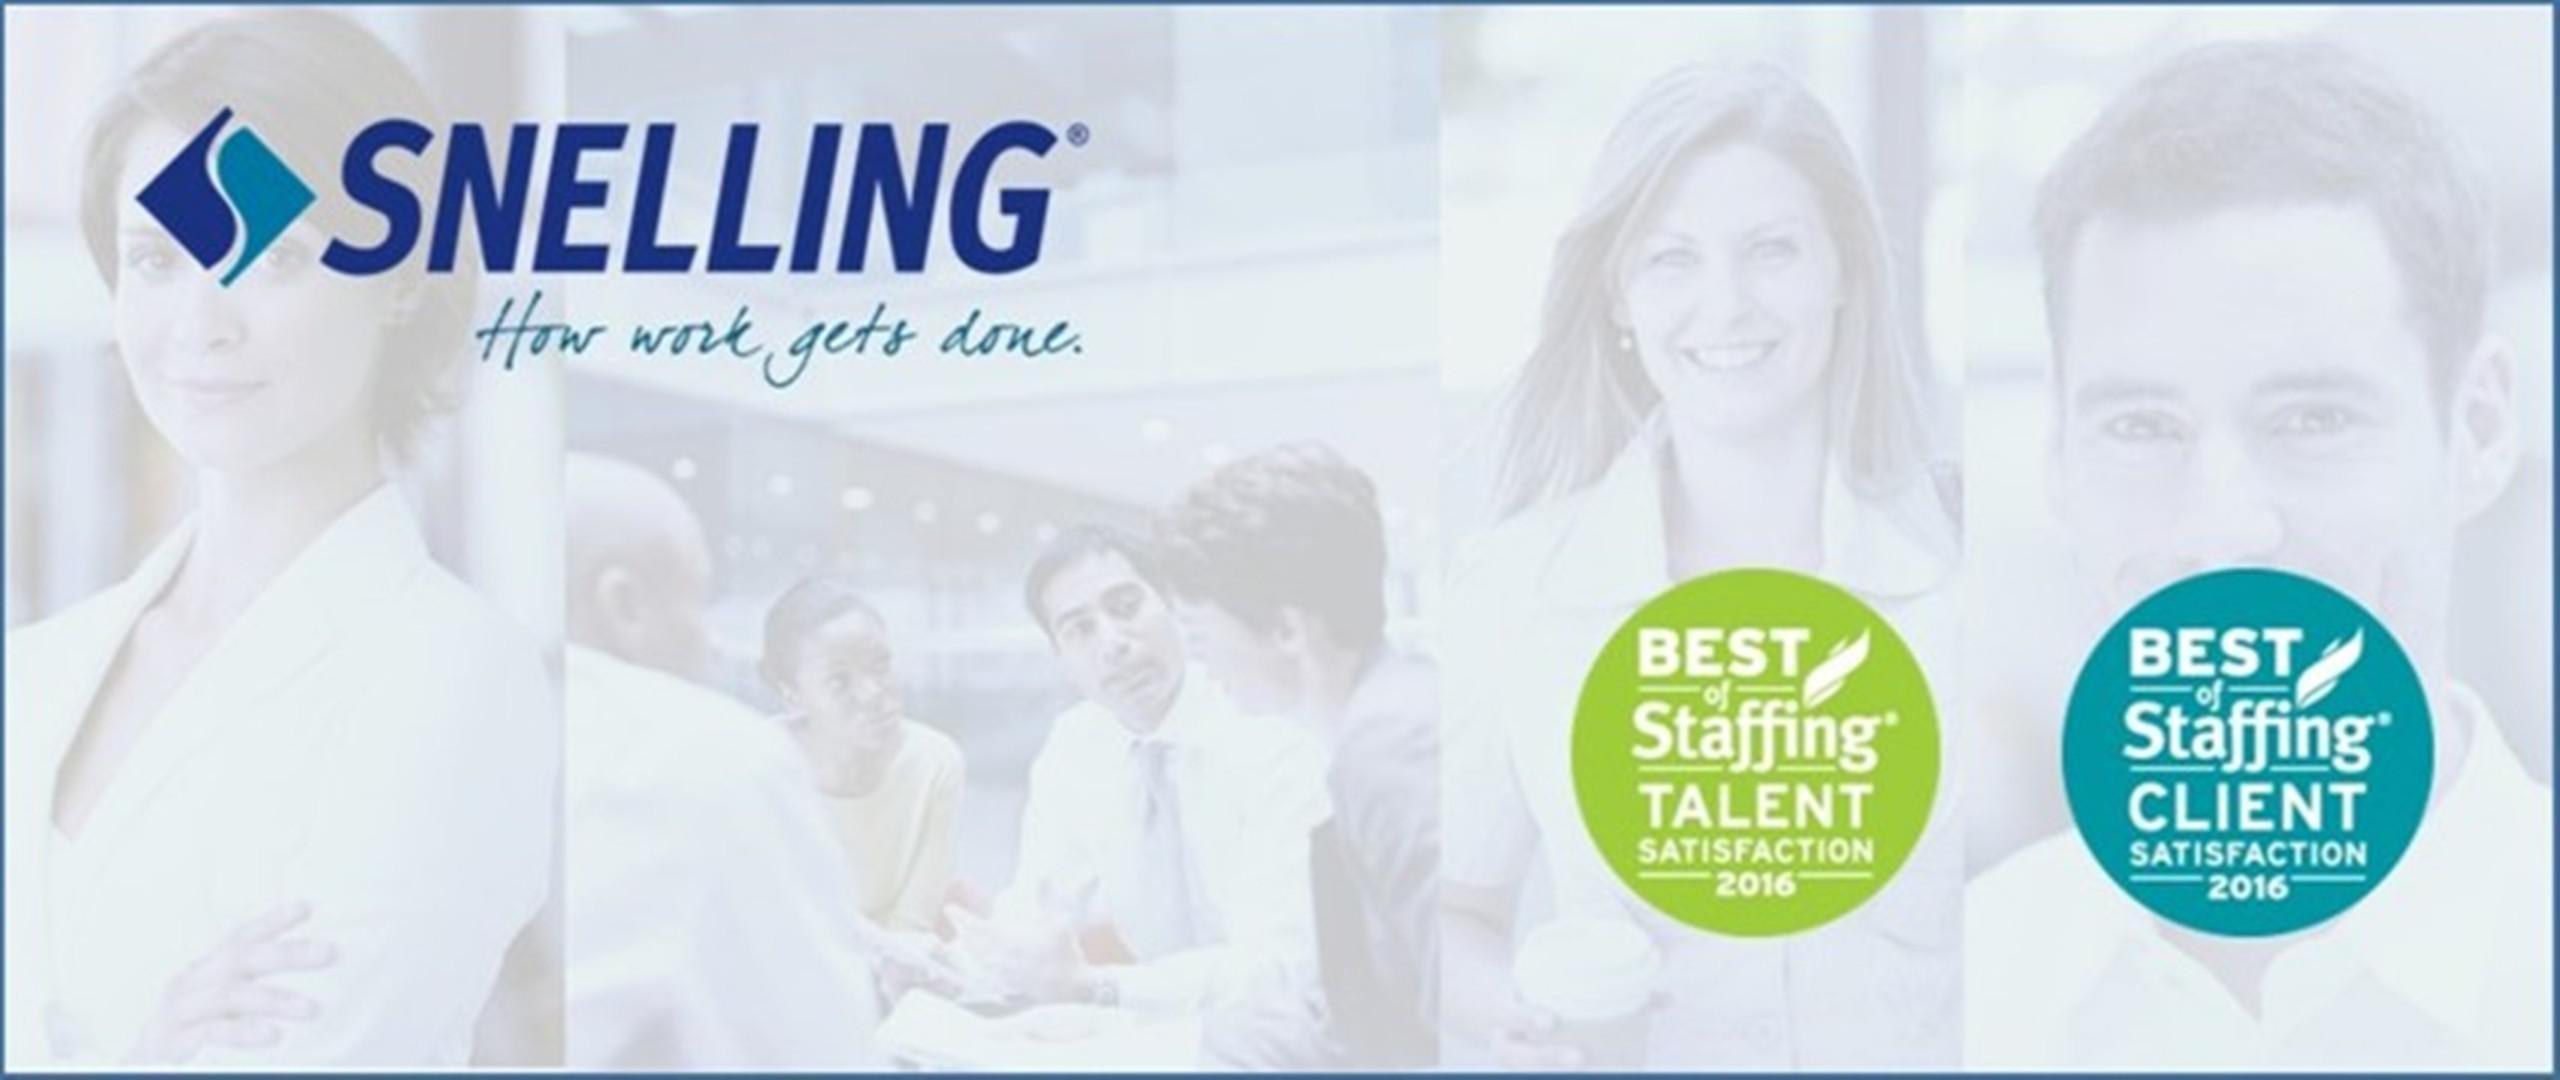 Snelling Staffing Services - Alameda